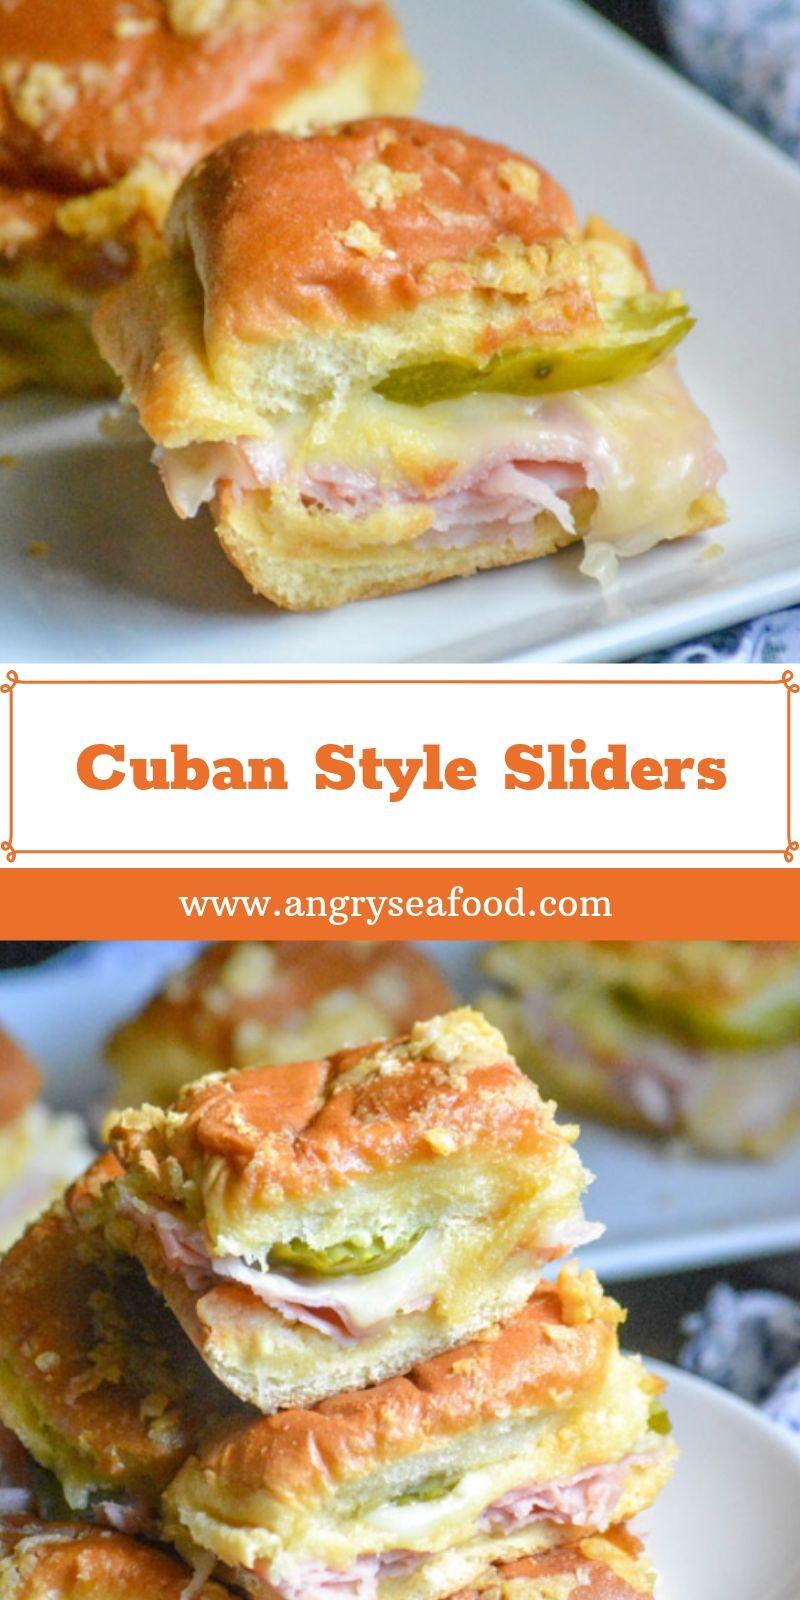 Cuban Style Sliders